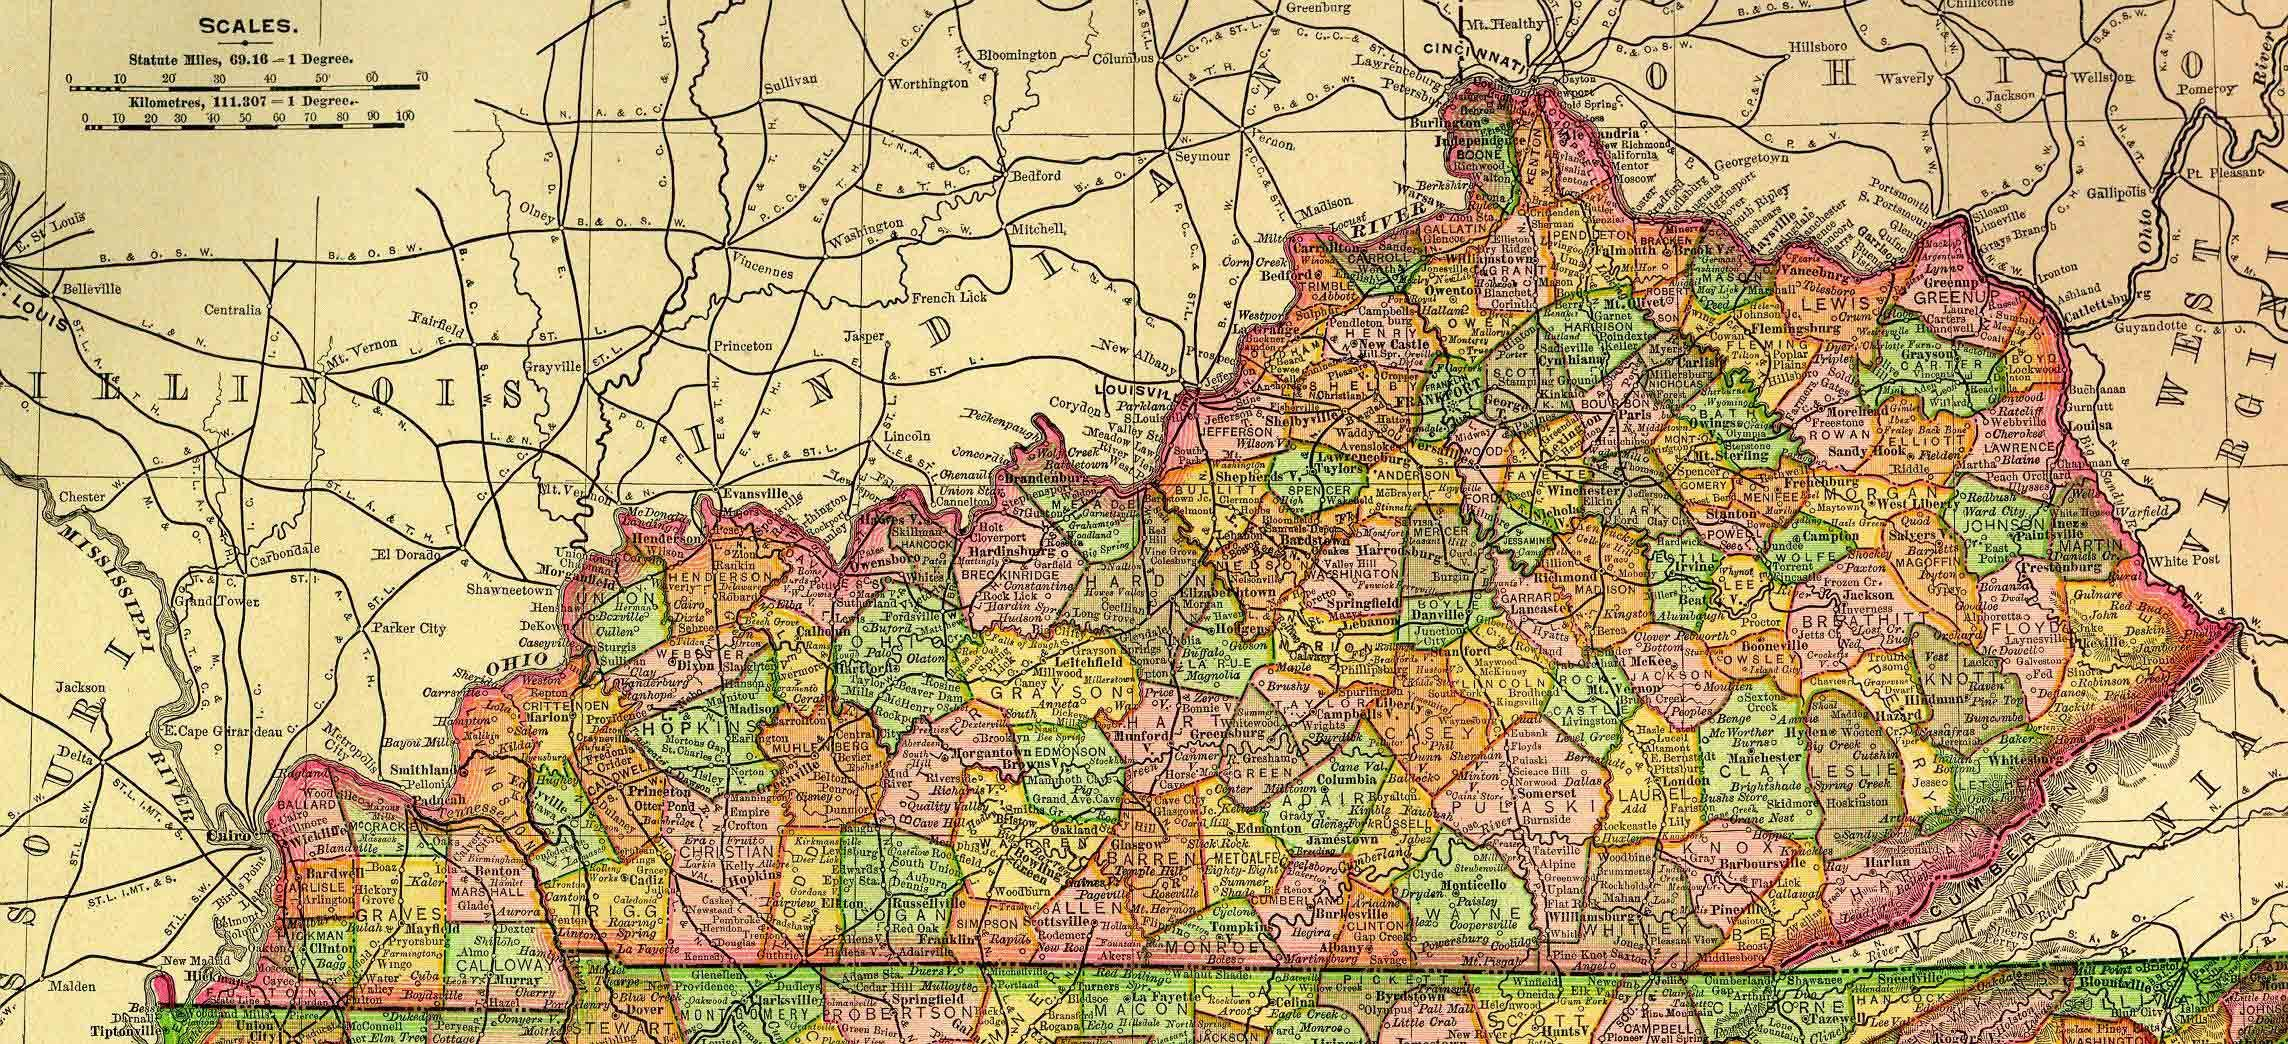 Map Kentucky County » Online Interactive Map Wallpapers | Online ...